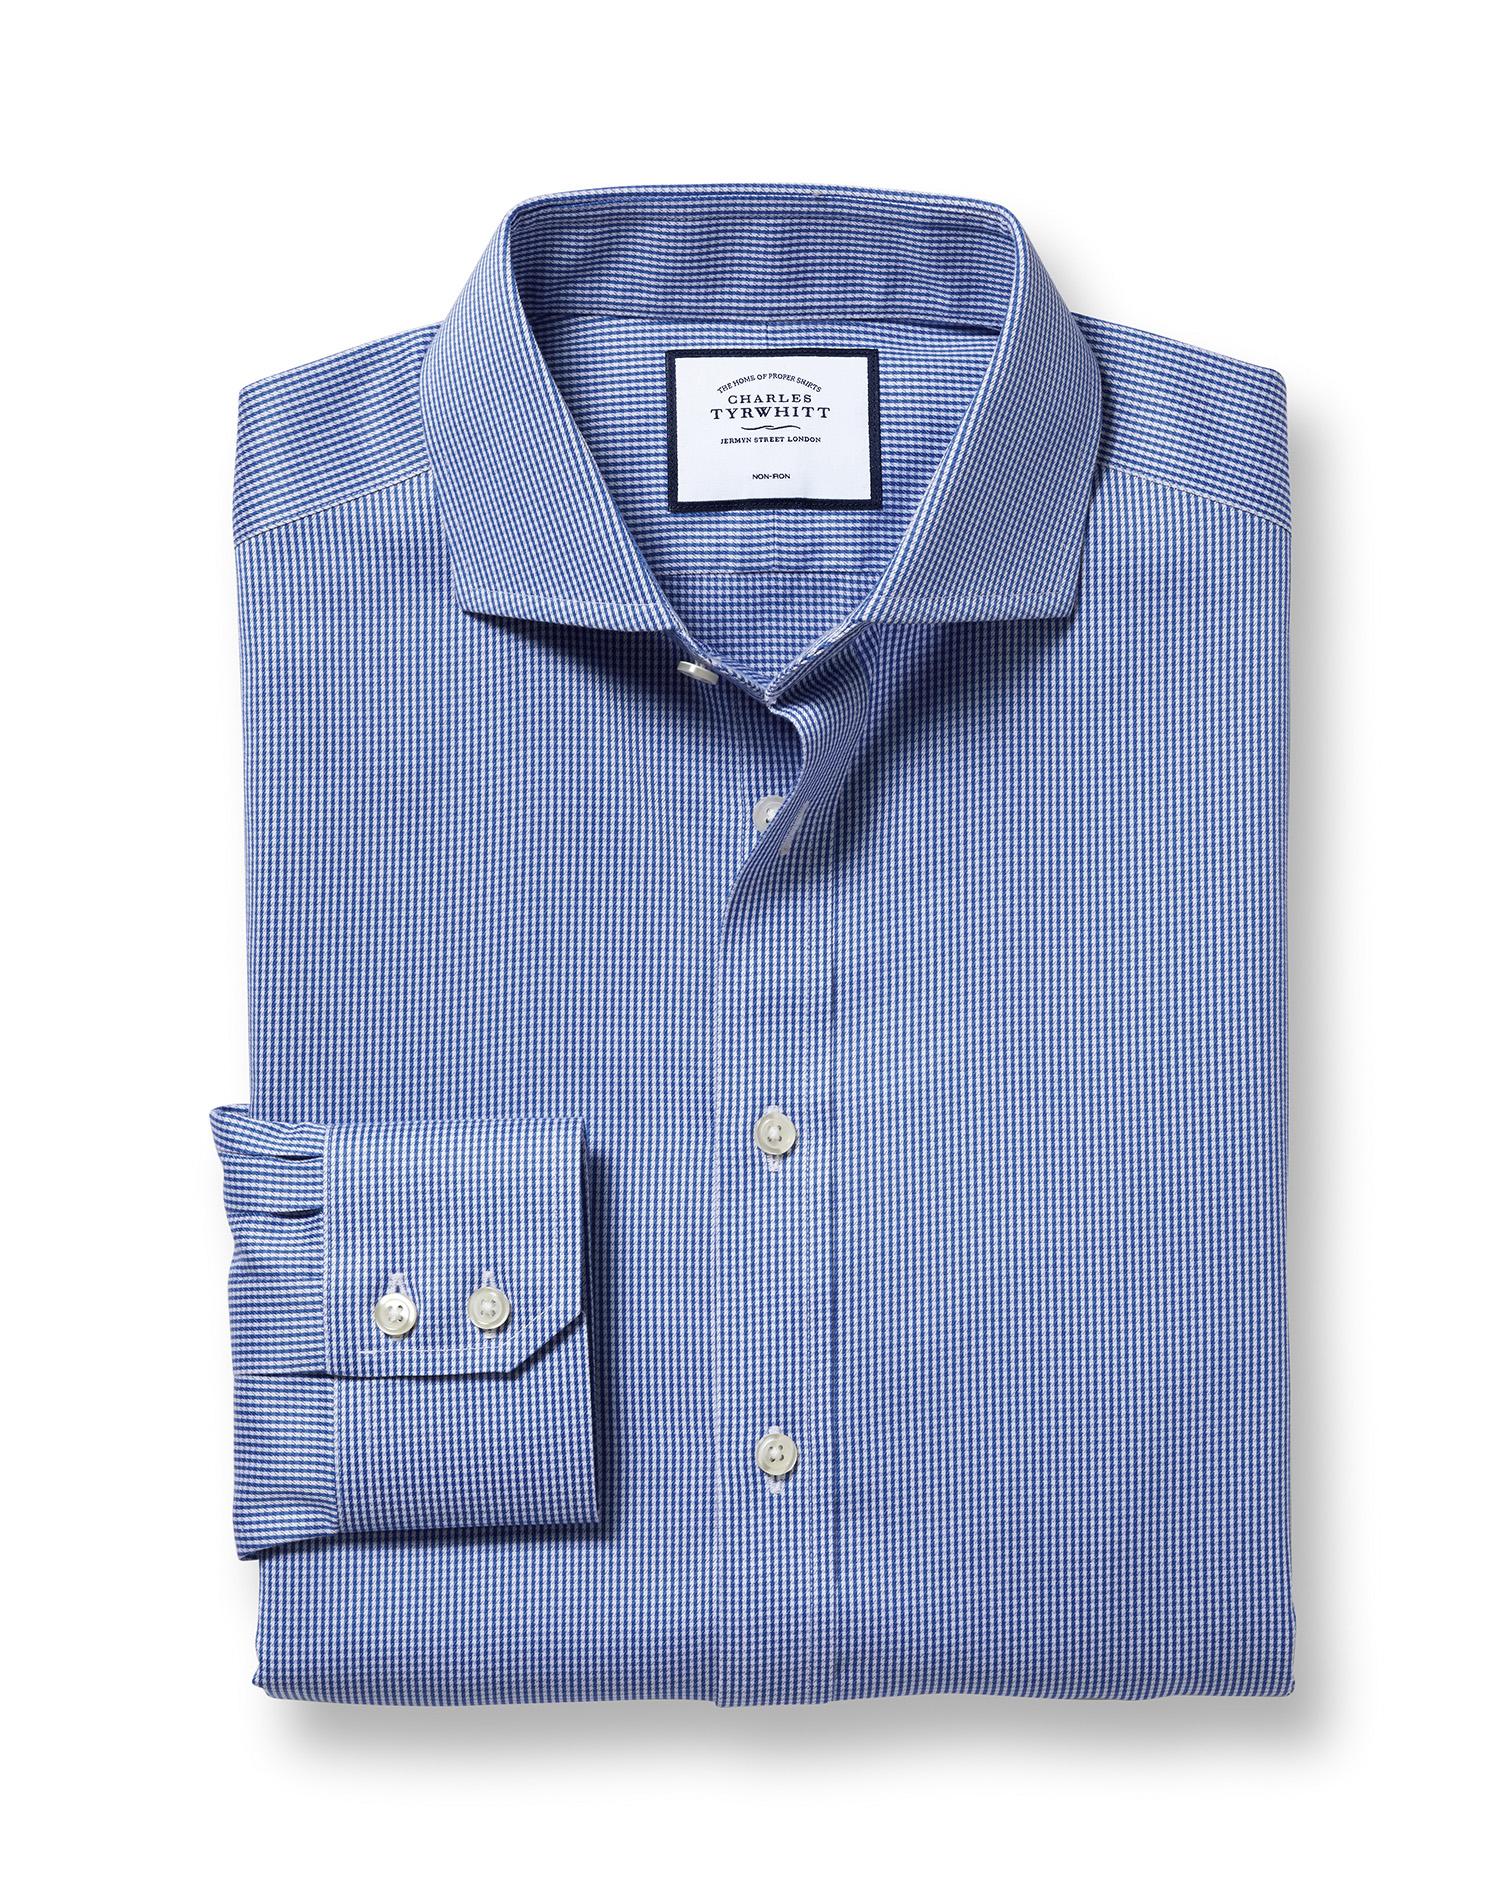 Extra Slim Fit Cutaway Non-Iron Puppytooth Royal Blue Cotton Formal Shirt Single Cuff Size 16.5/36 b